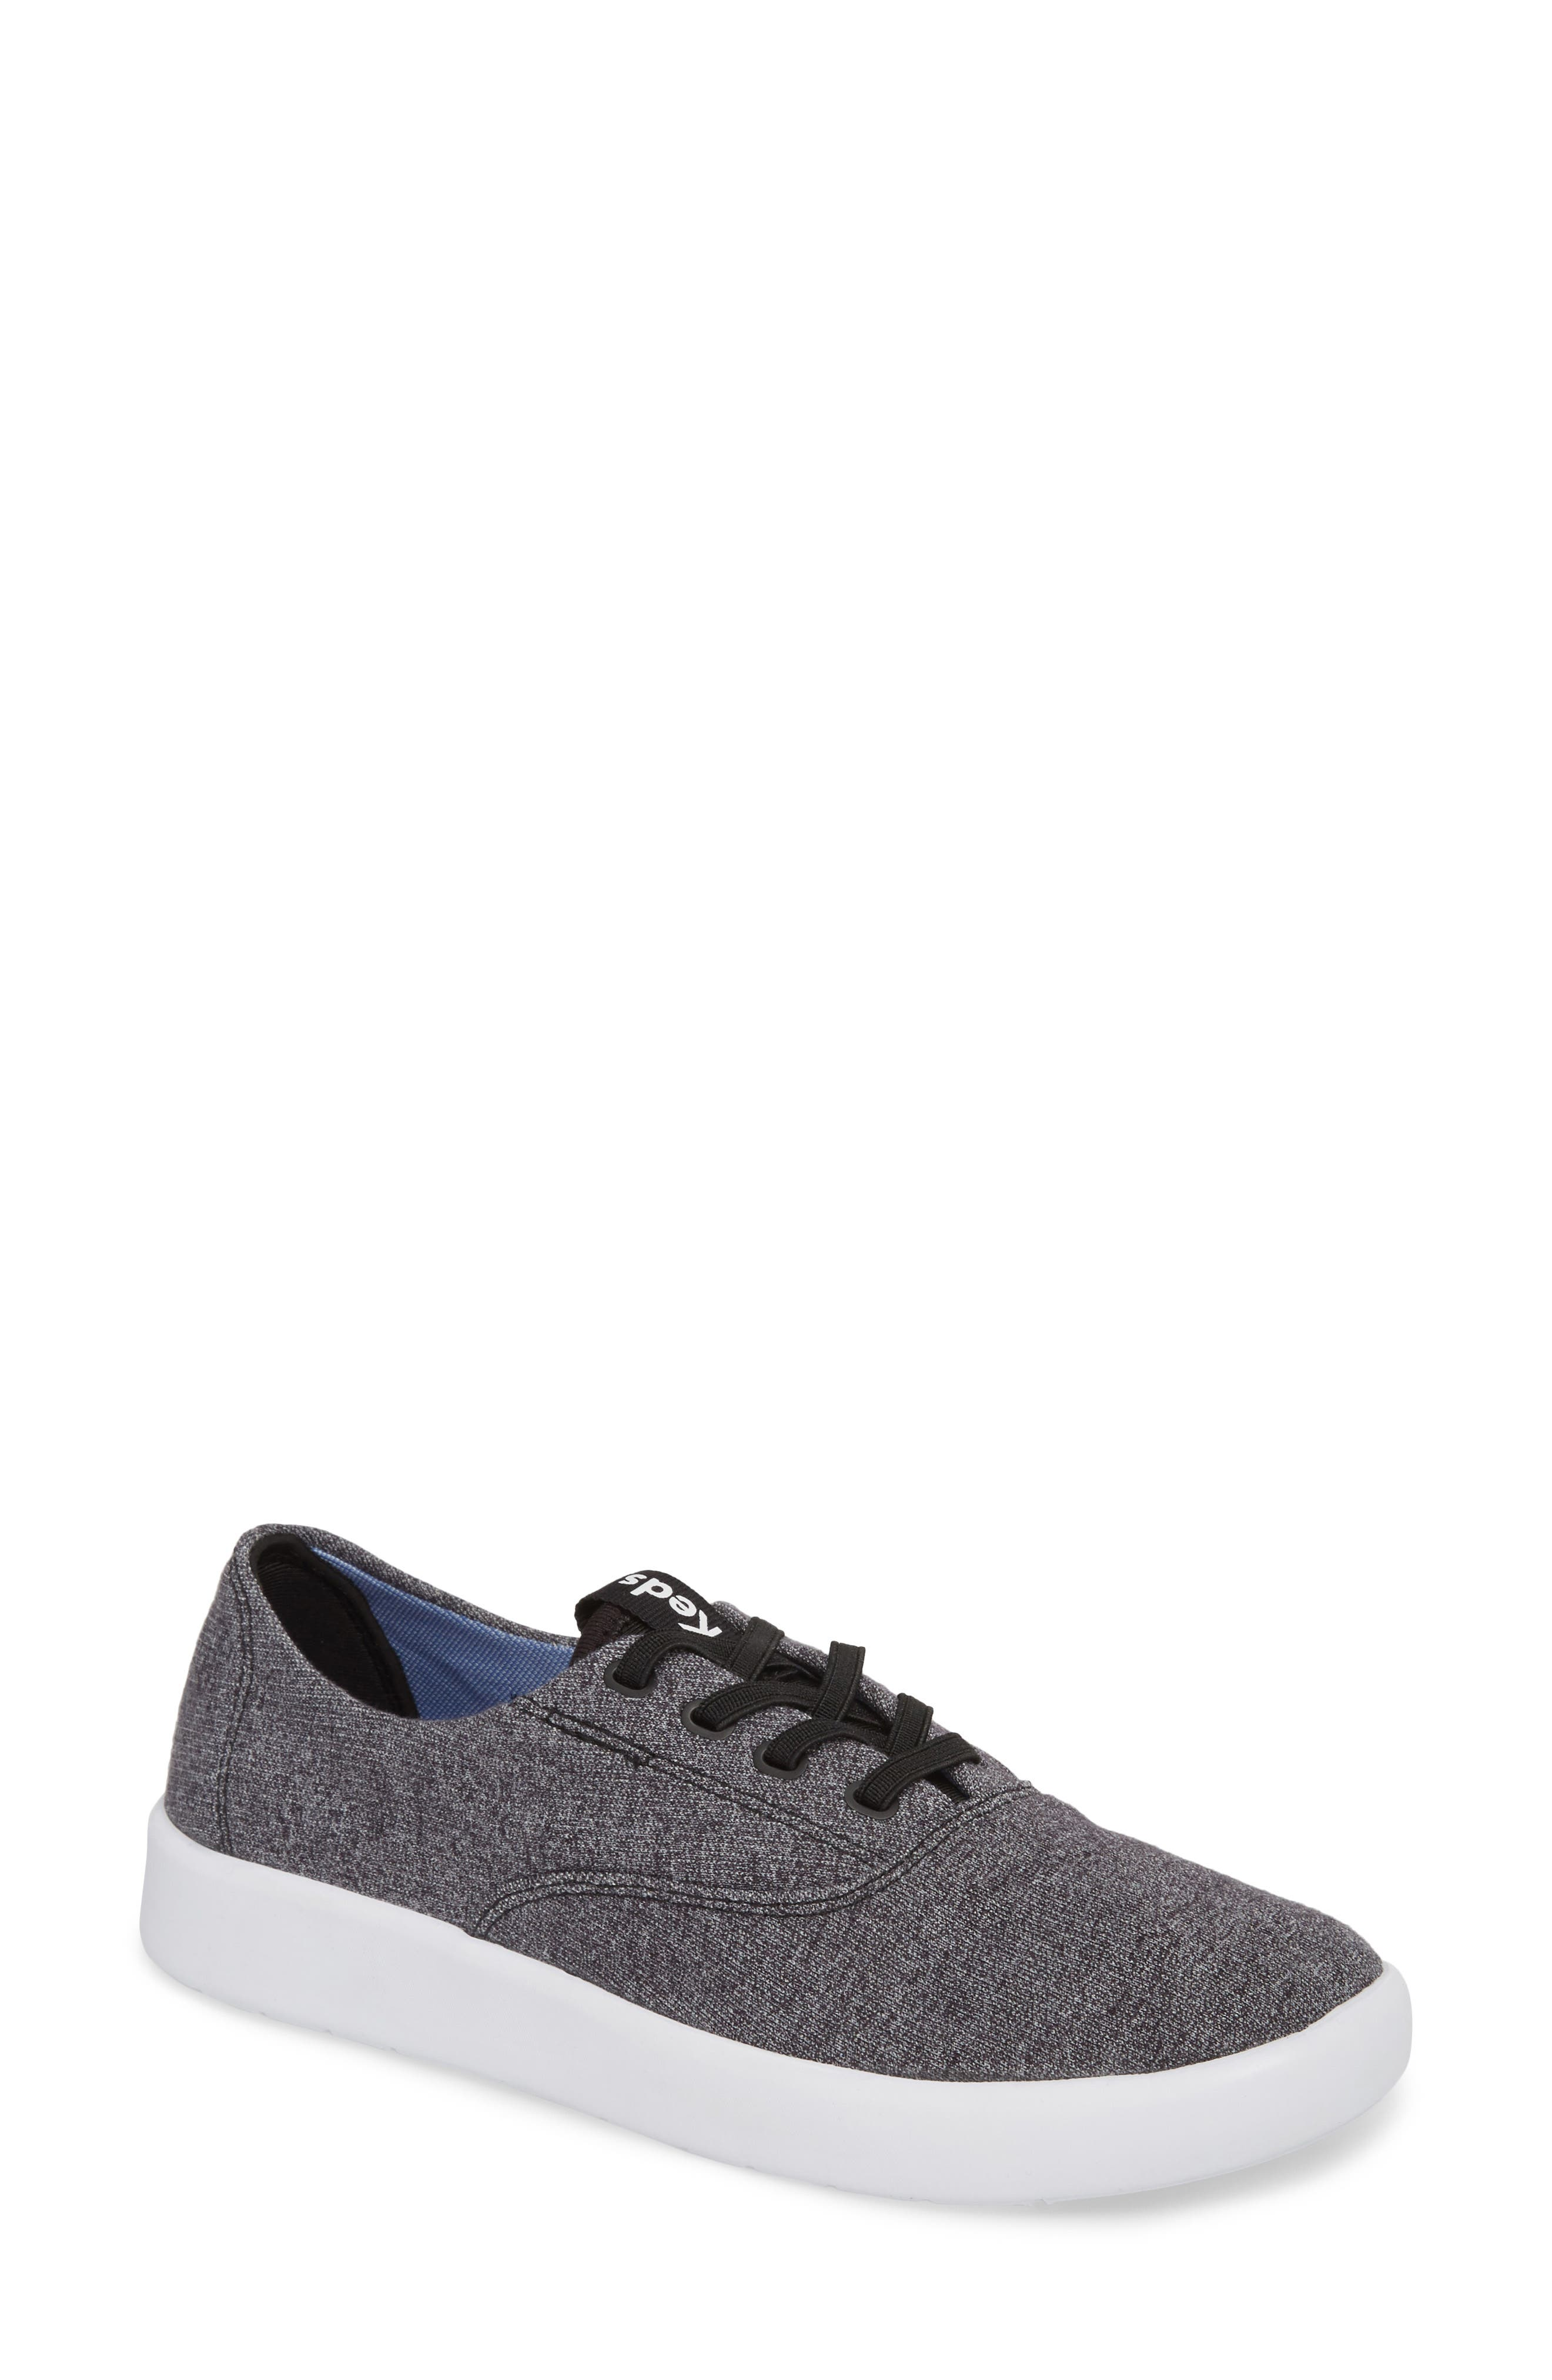 Studio Leap Sneaker,                             Main thumbnail 1, color,                             Charcoal